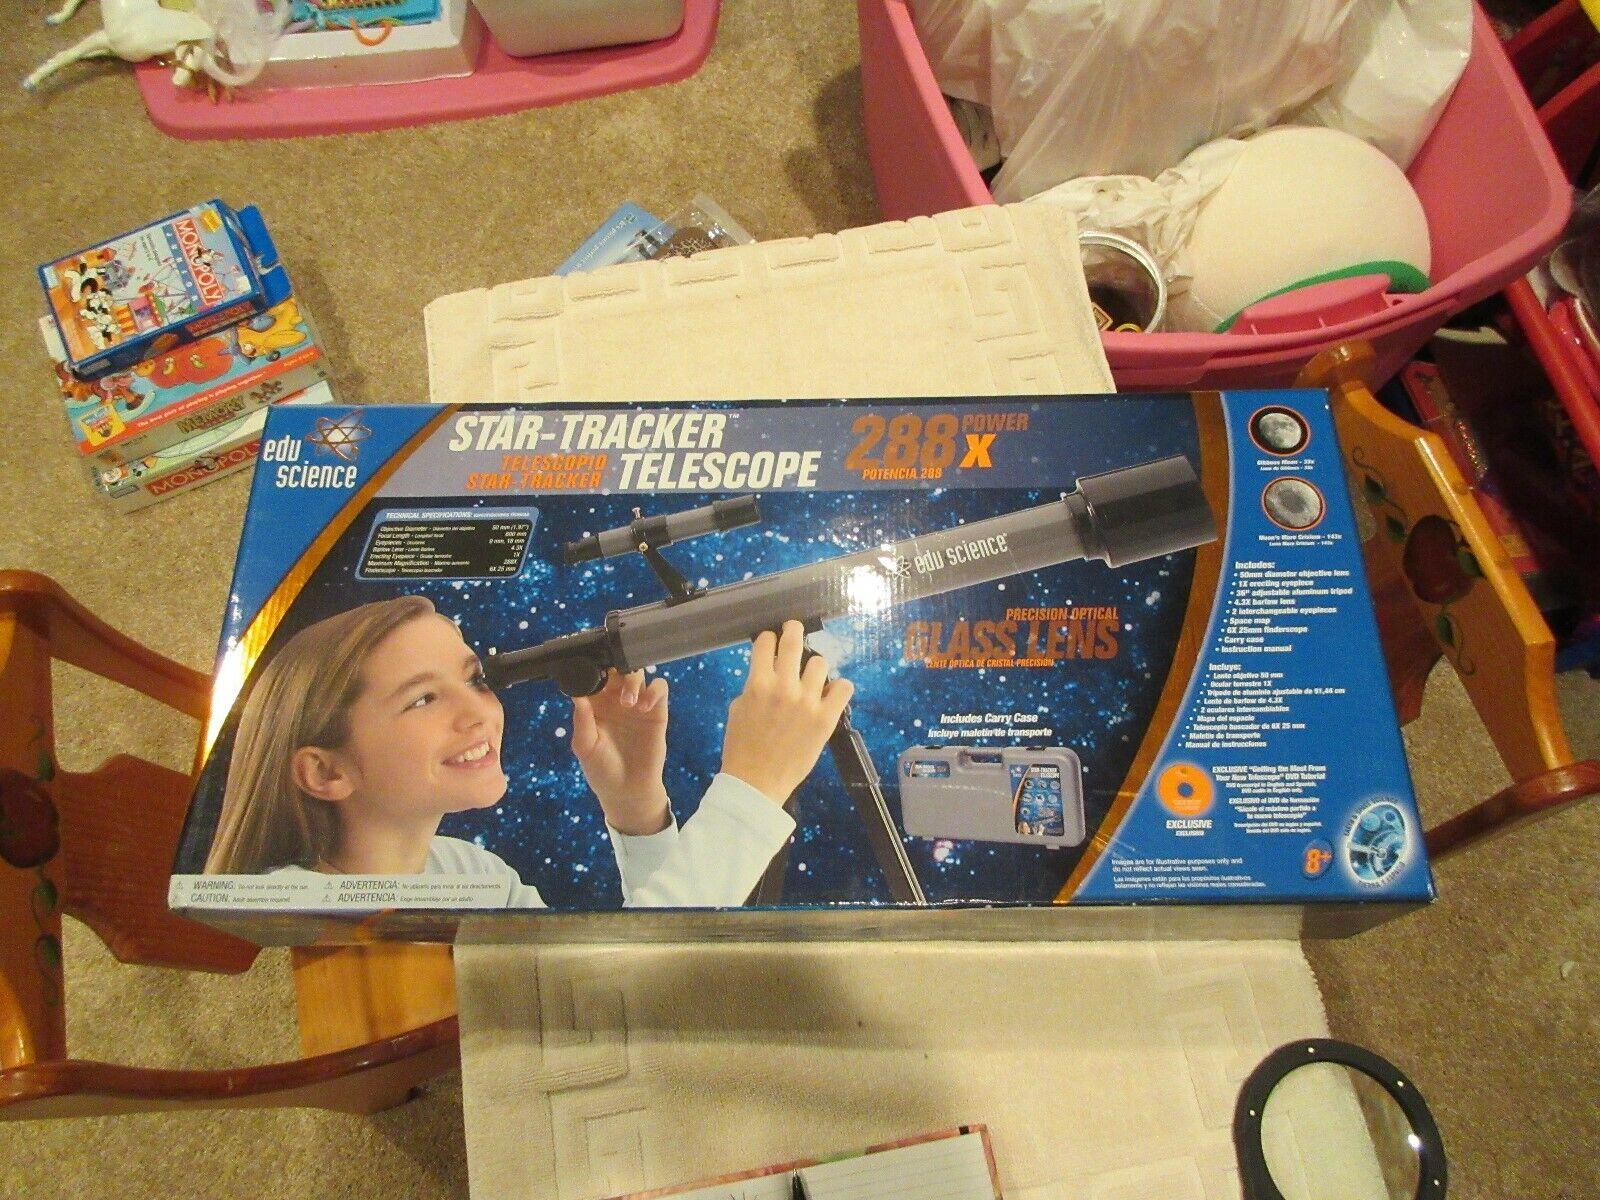 Star-Tracker Telescope , 288 Power X , Edu Science , Ne